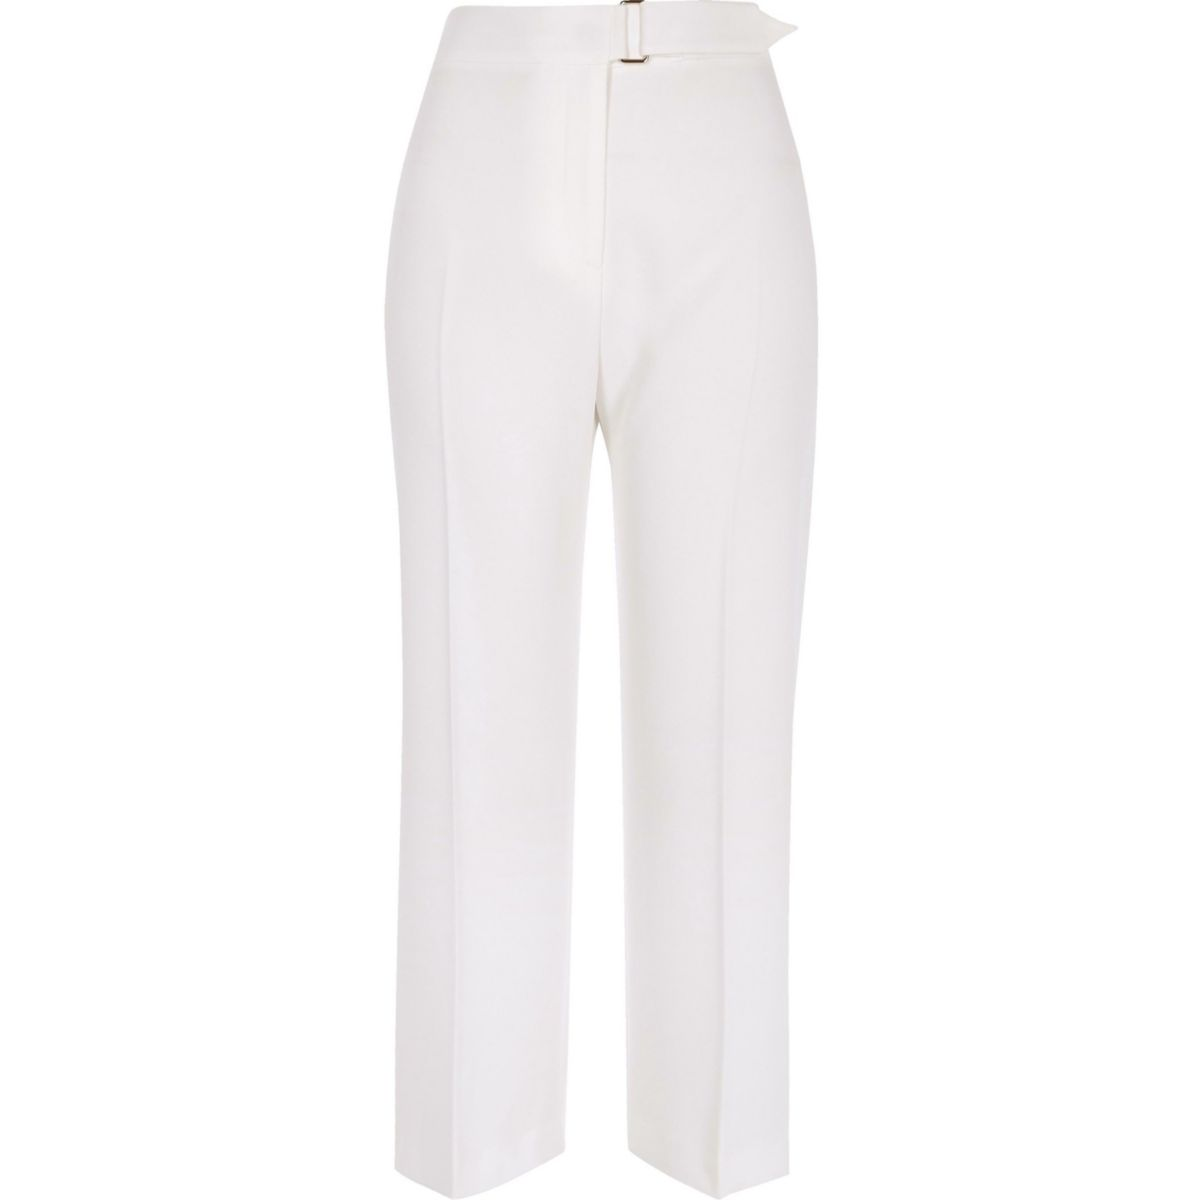 White buckle waist trousers